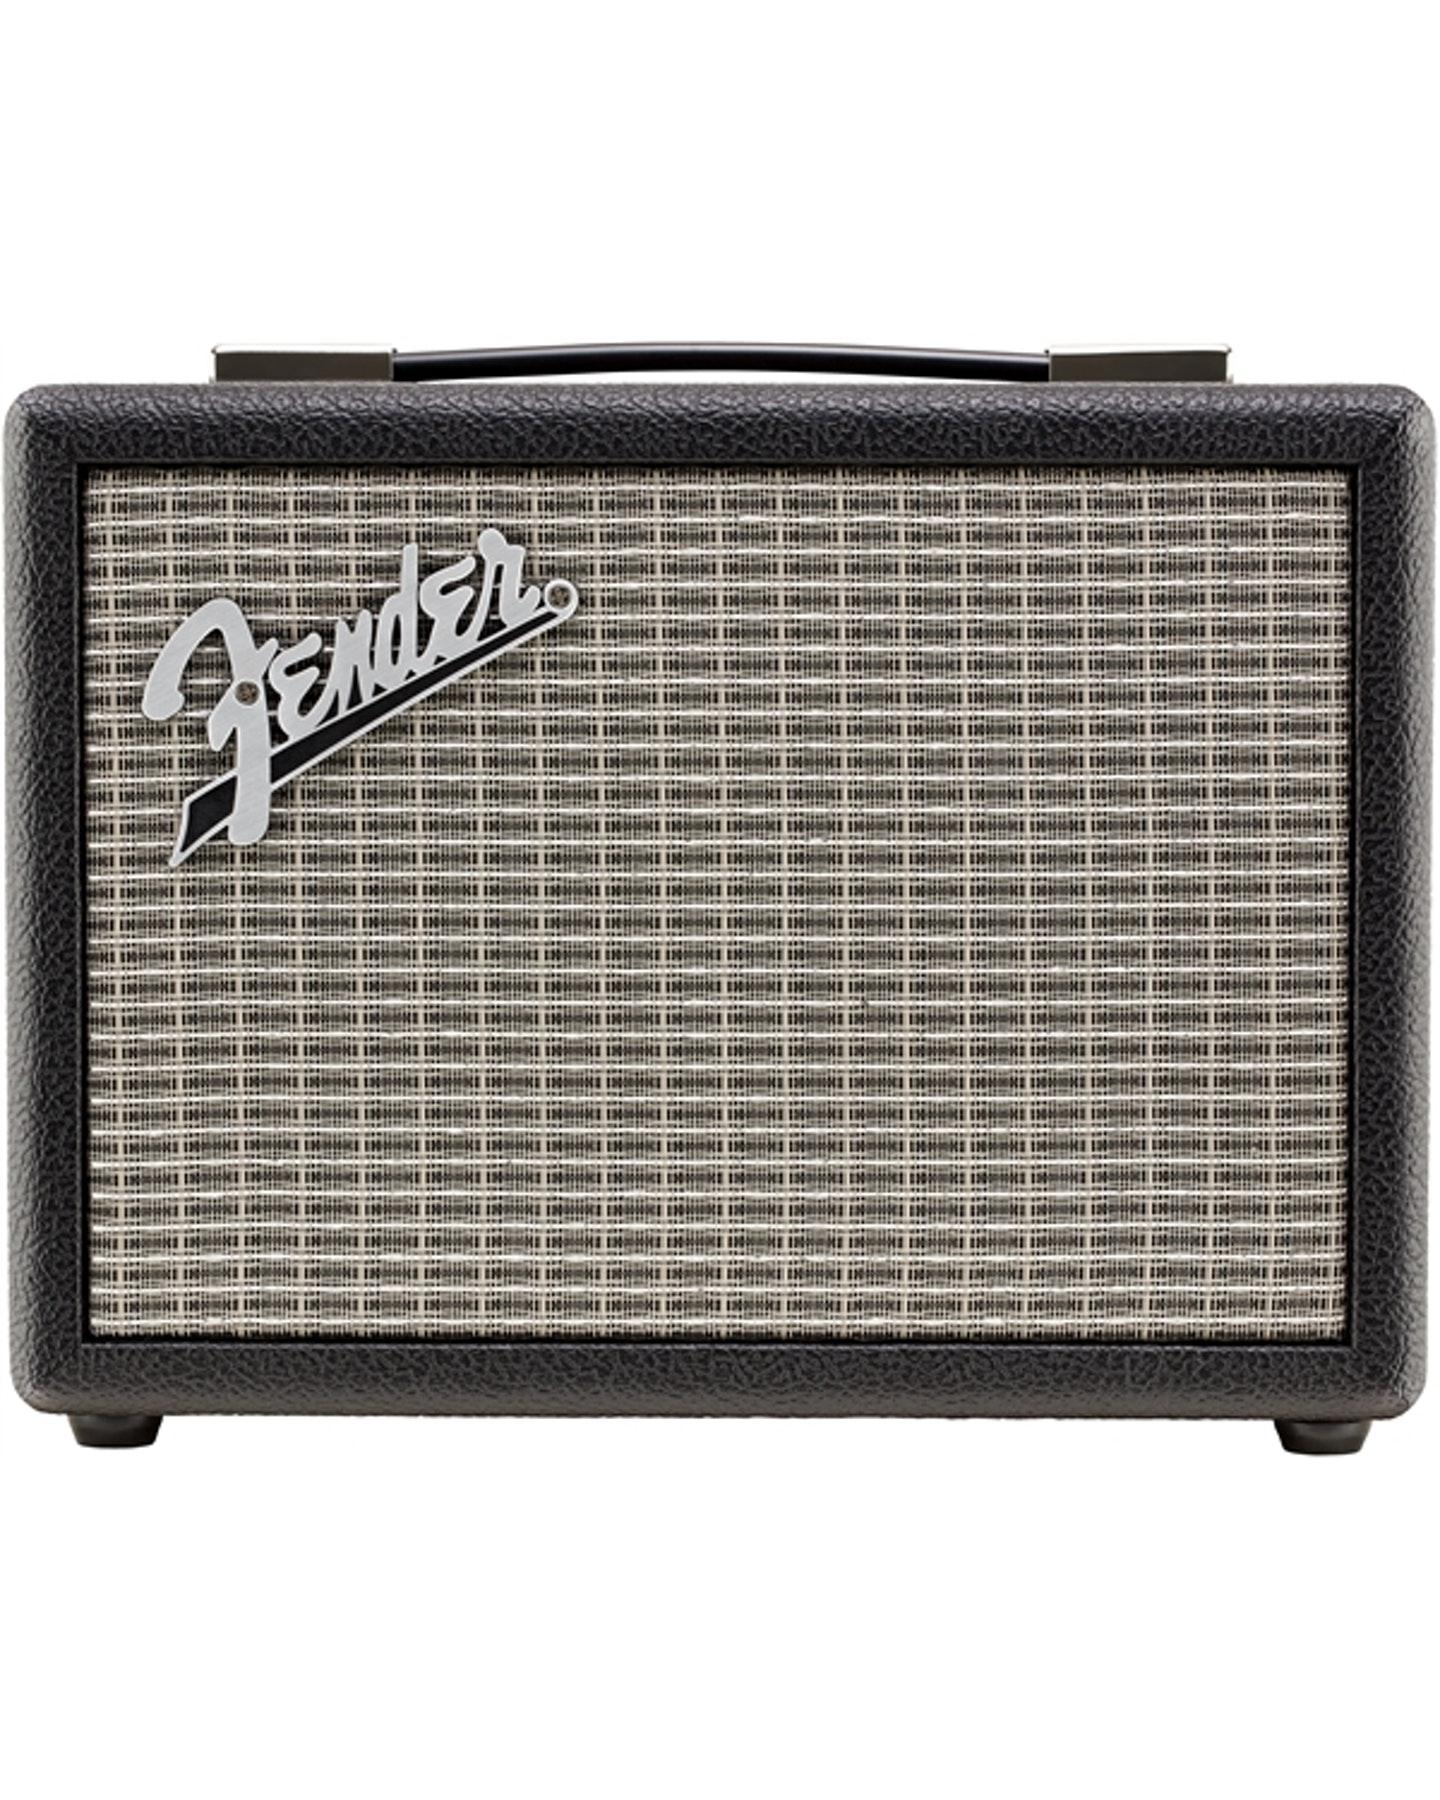 Fender Indio Bluetooth Speaker Black